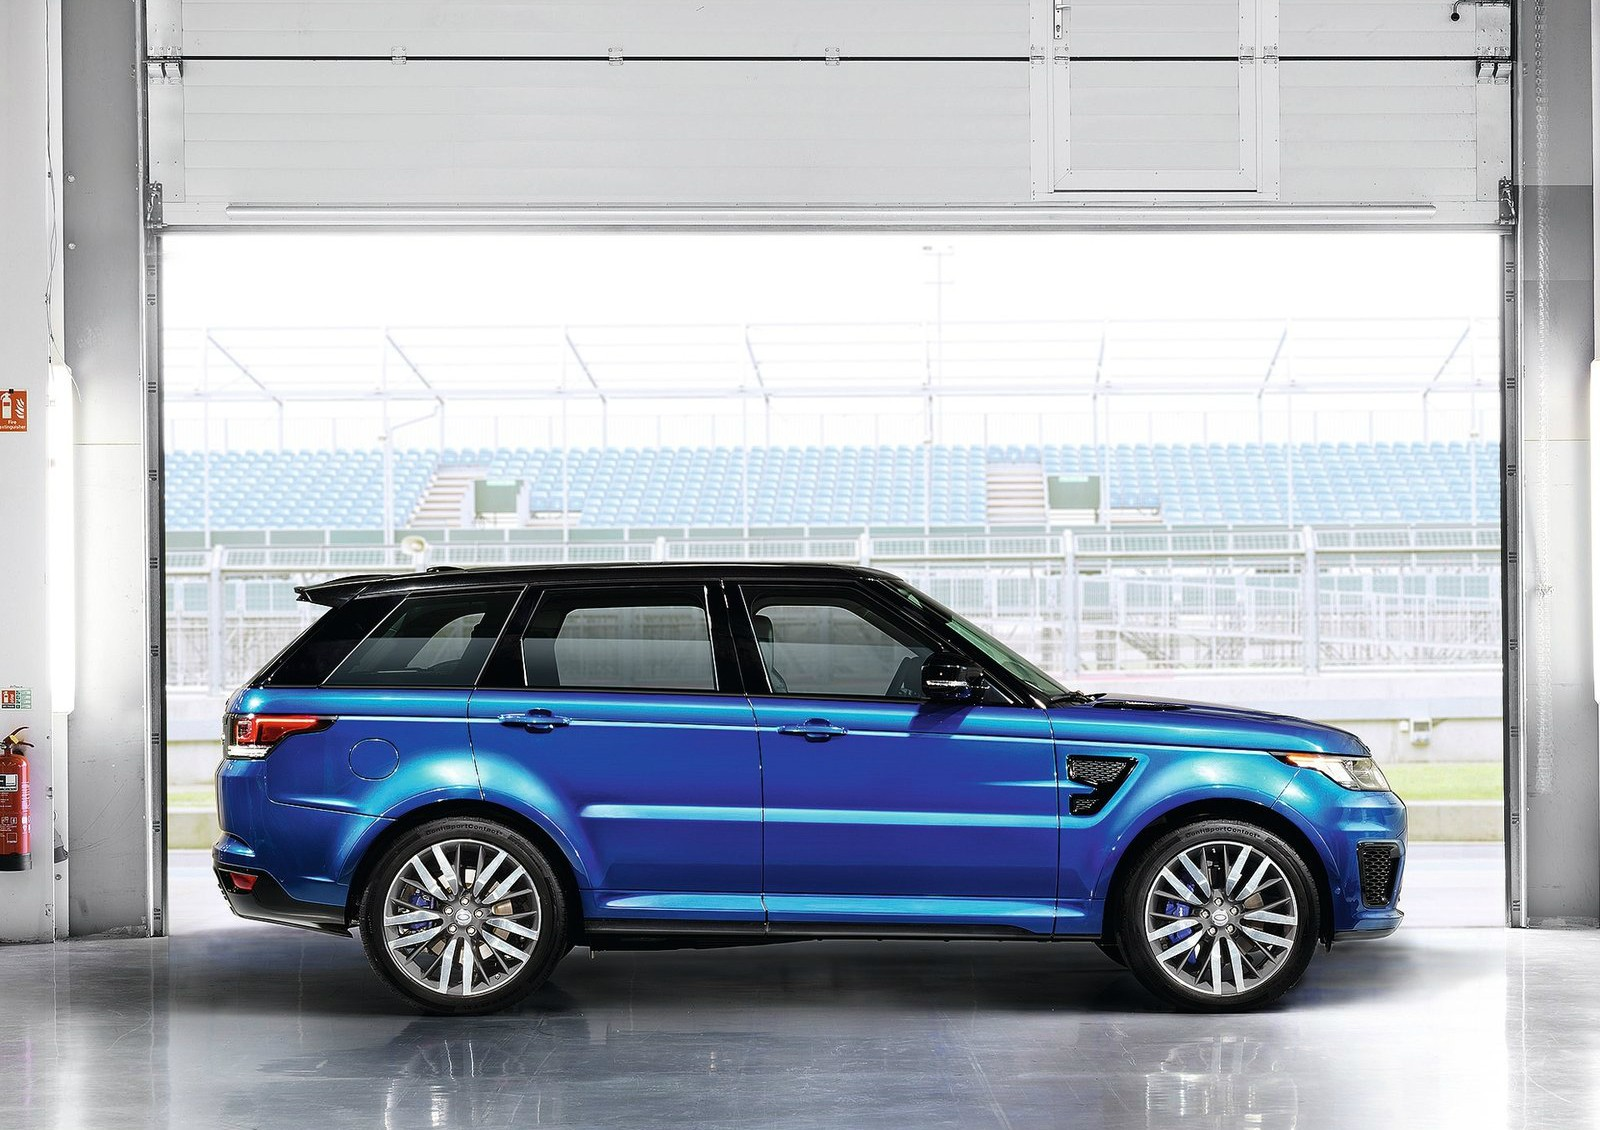 2015 Range Rover Sport Svr Pricing Announced Autoevolution